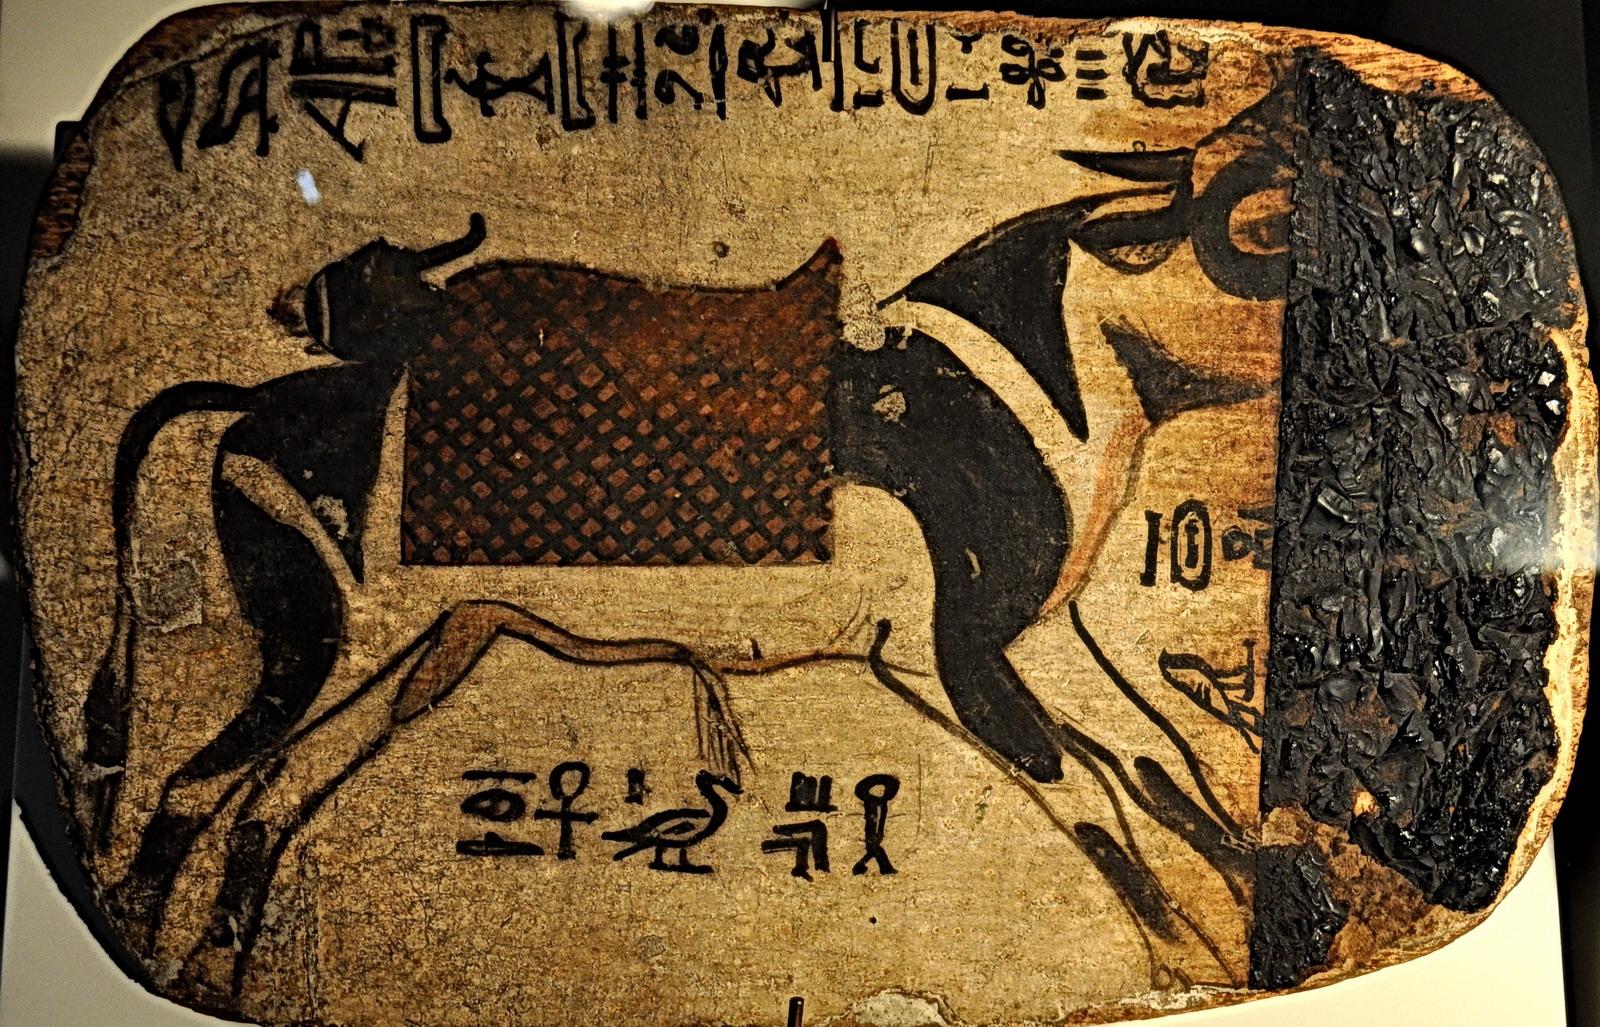 Musée Curtius - taureau Apis